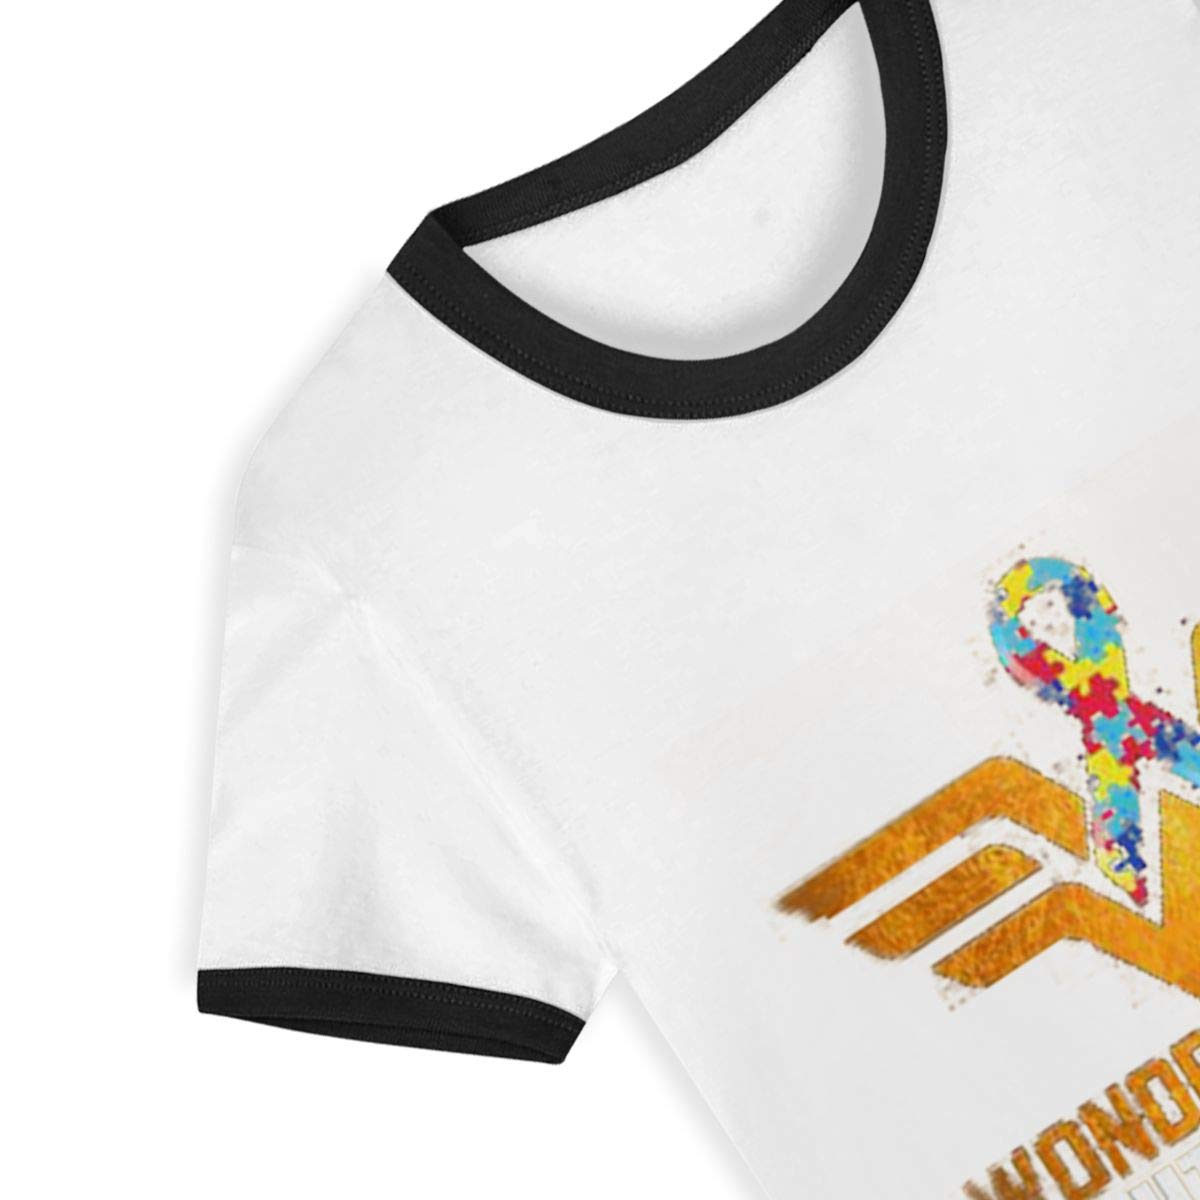 CY SHOP Wonder Warrior Fight for Autism Childrens Boys Girls Contrast Short Sleeve T-Shirt